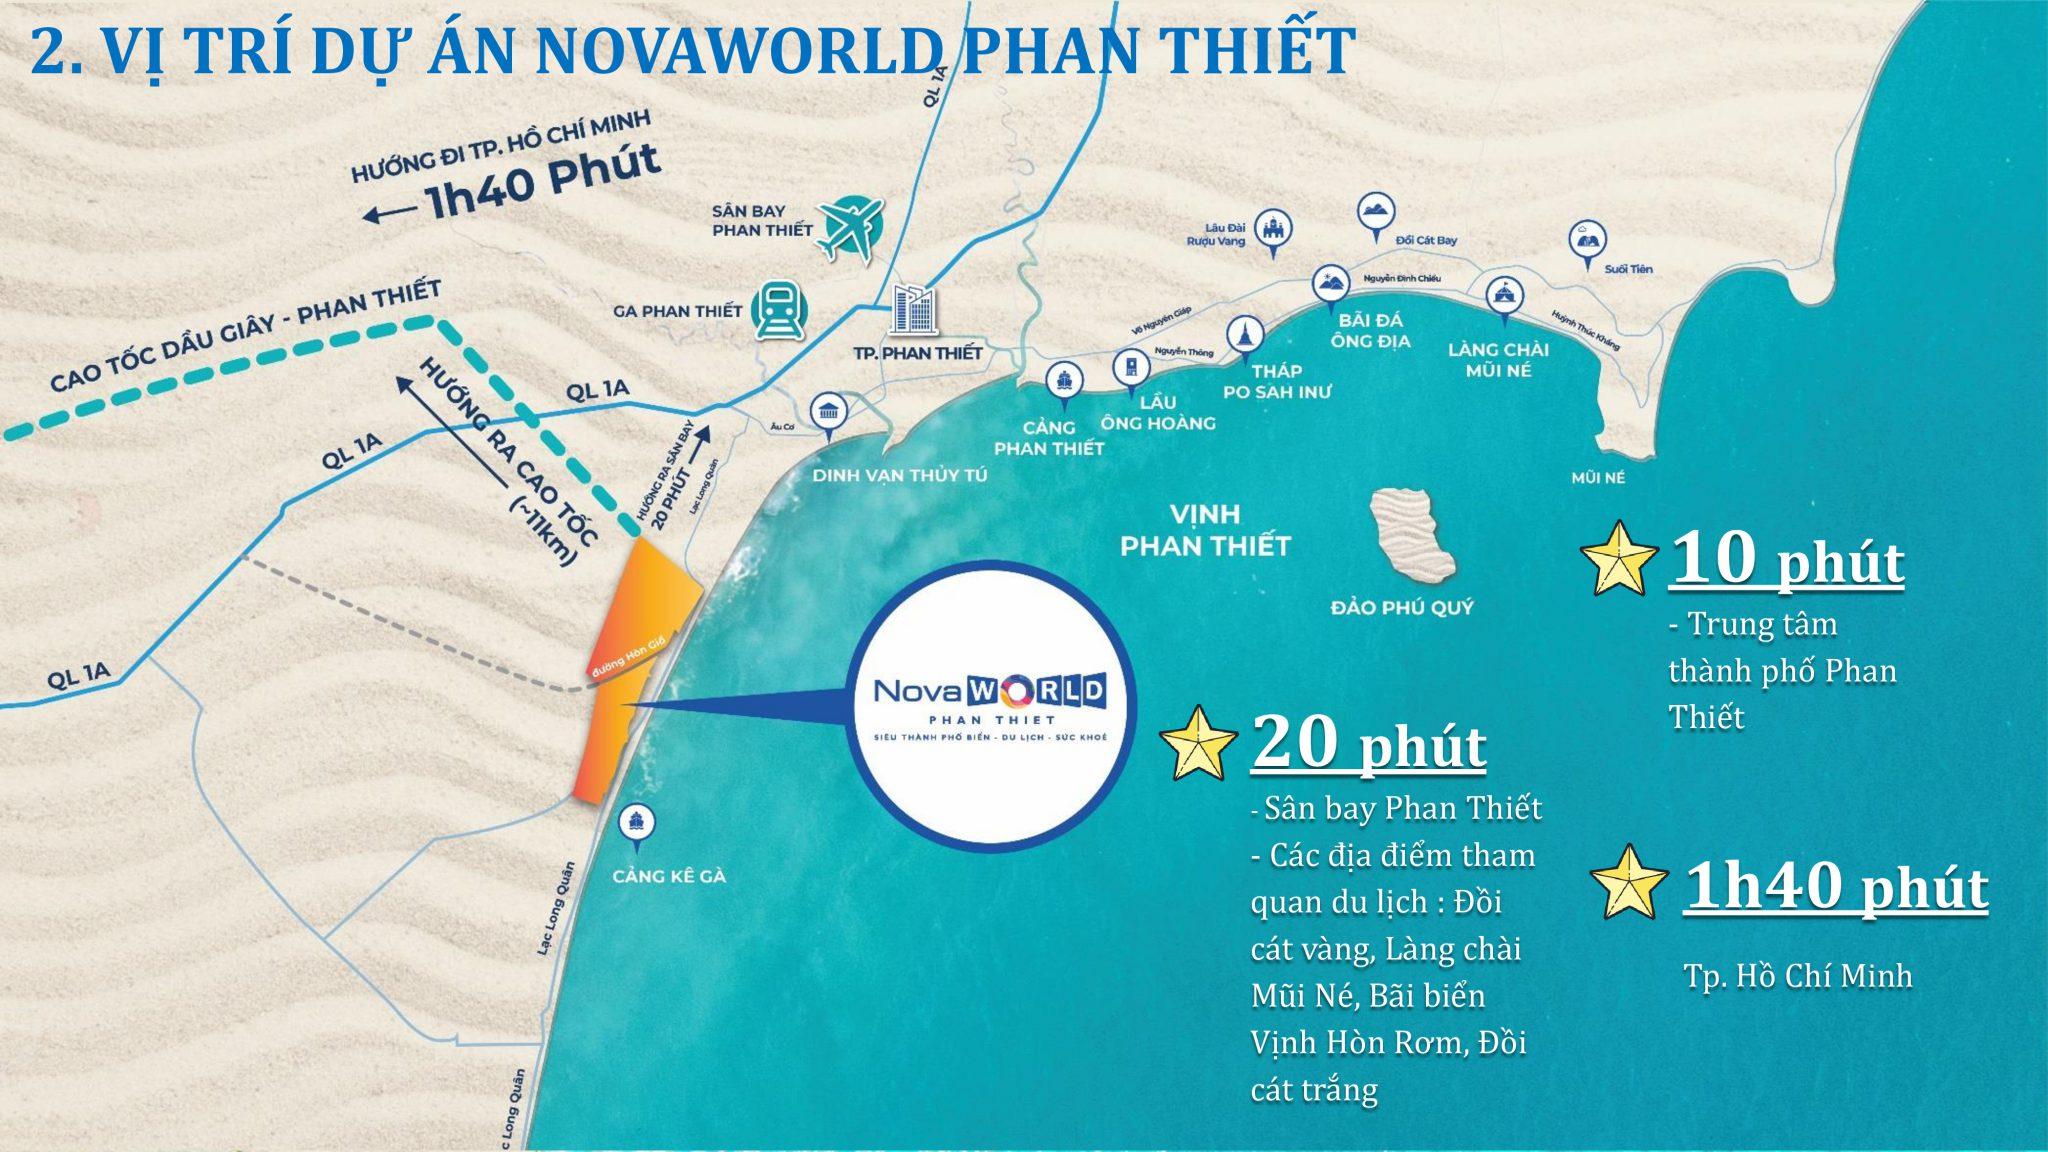 Vi Tri Du An Novaworld Phan Thiet